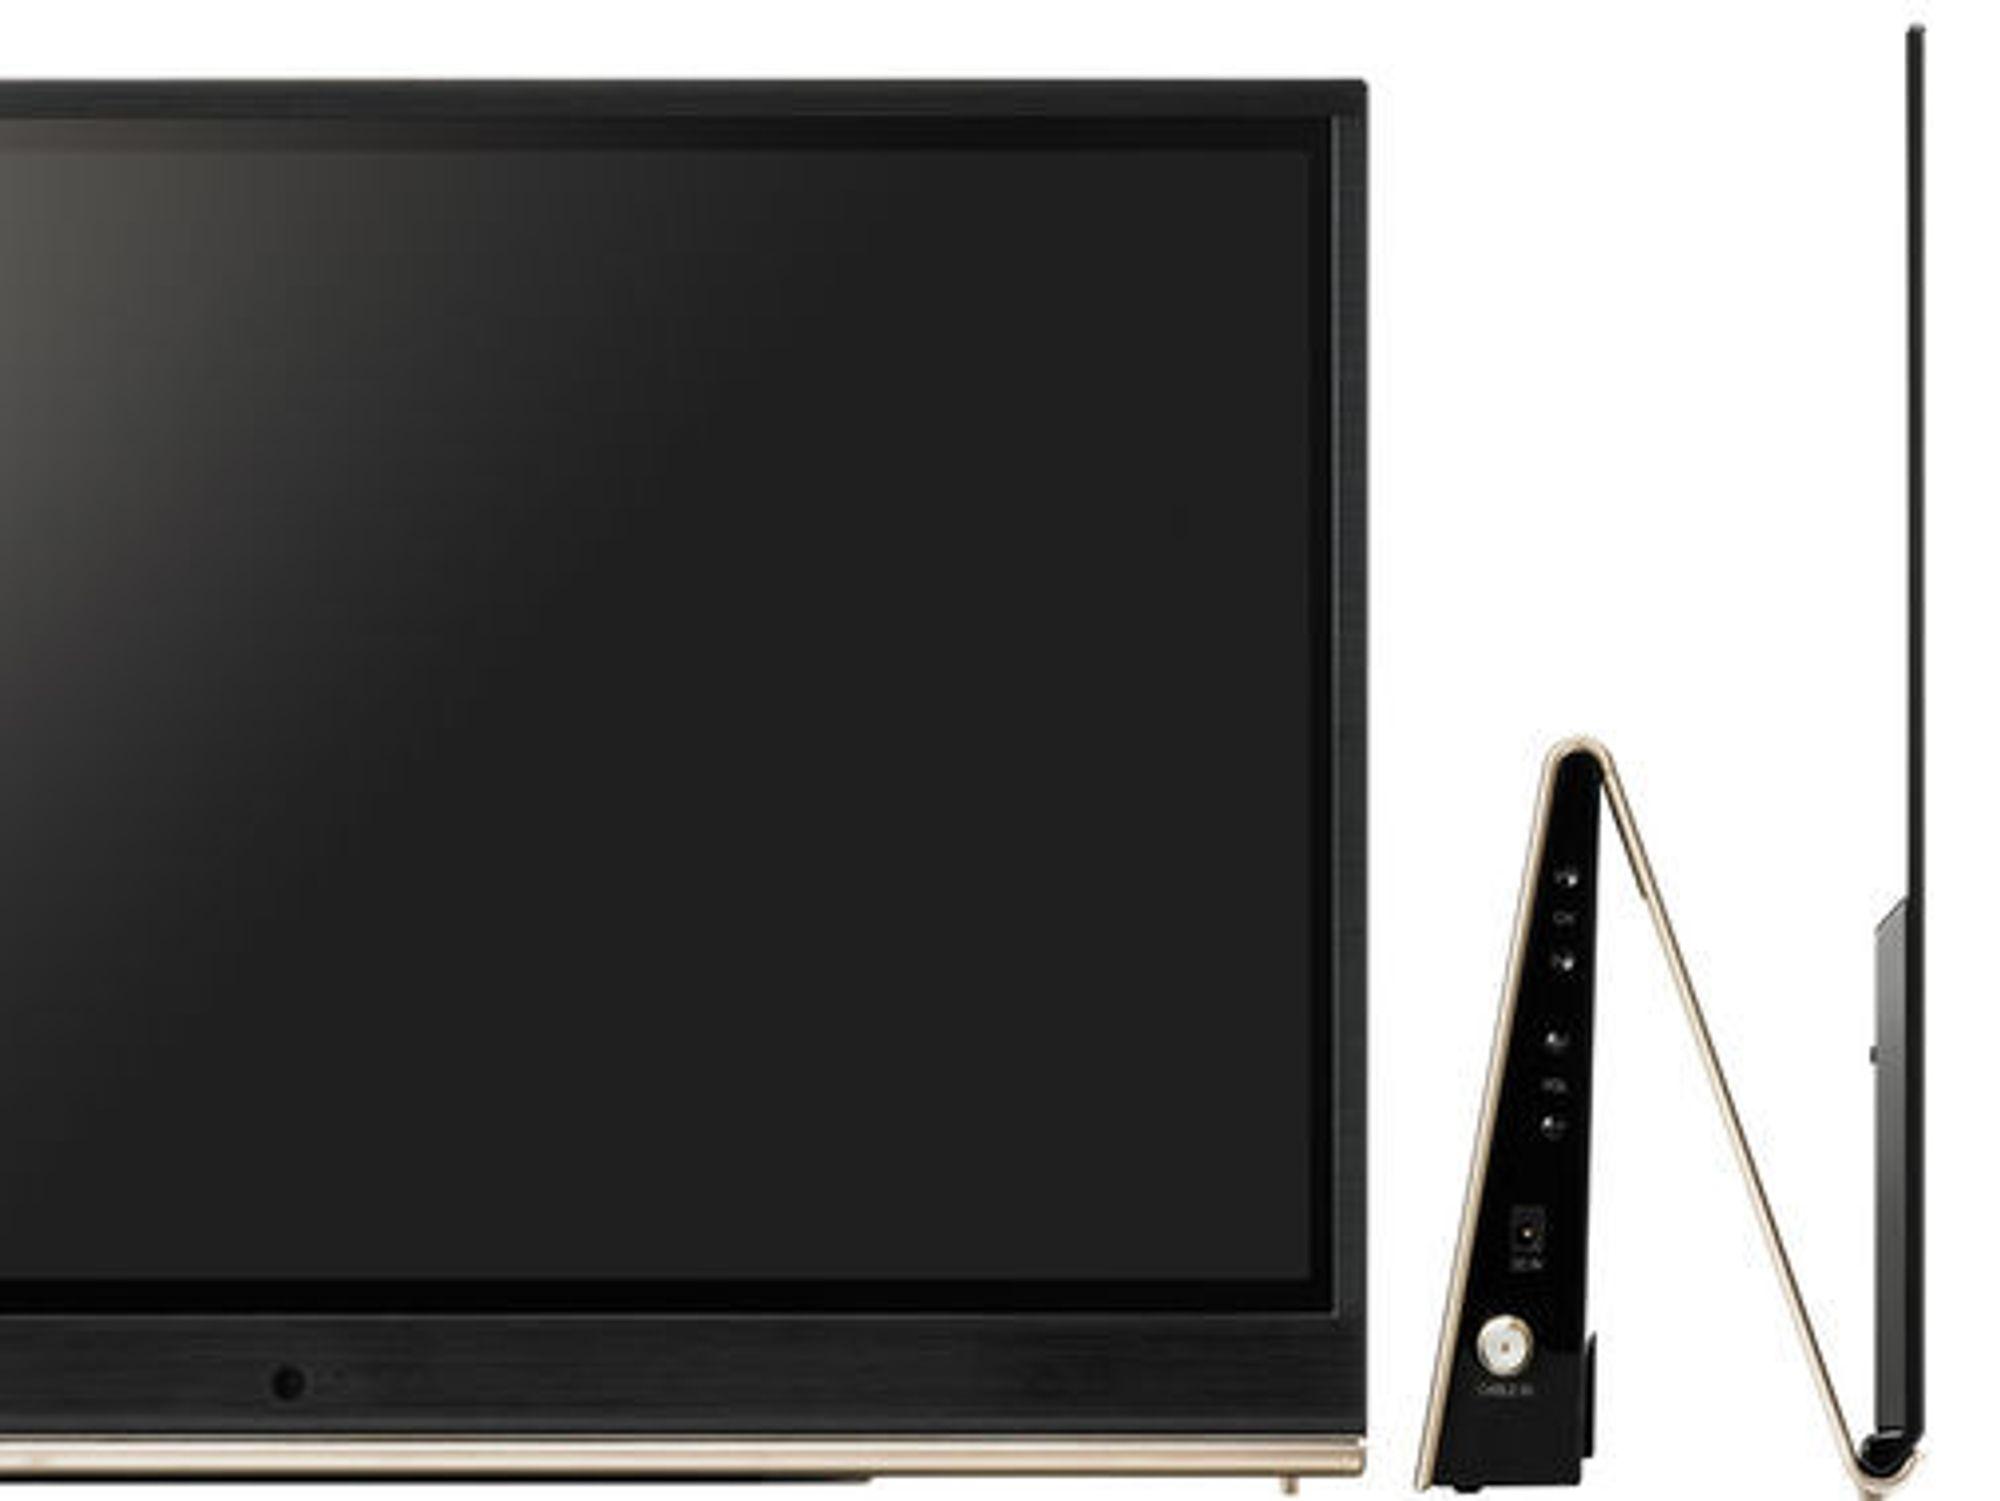 LG EL9500 OLED-tv